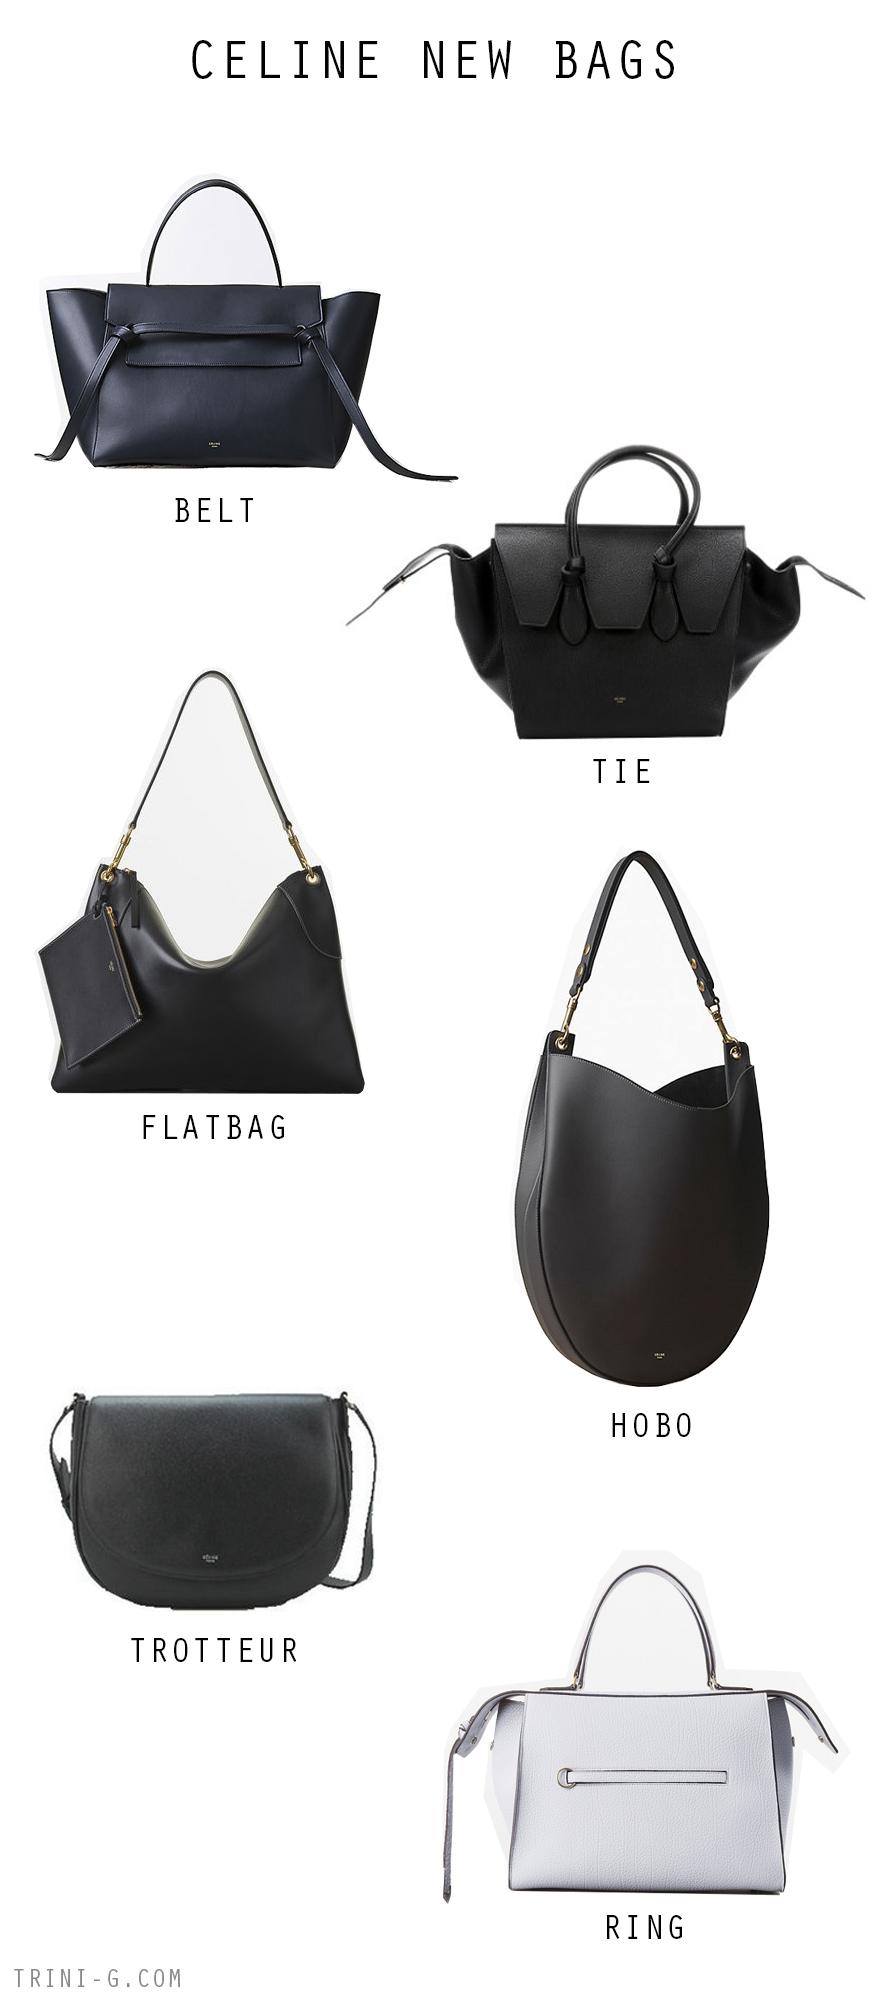 Trini blog| Celine newer bags